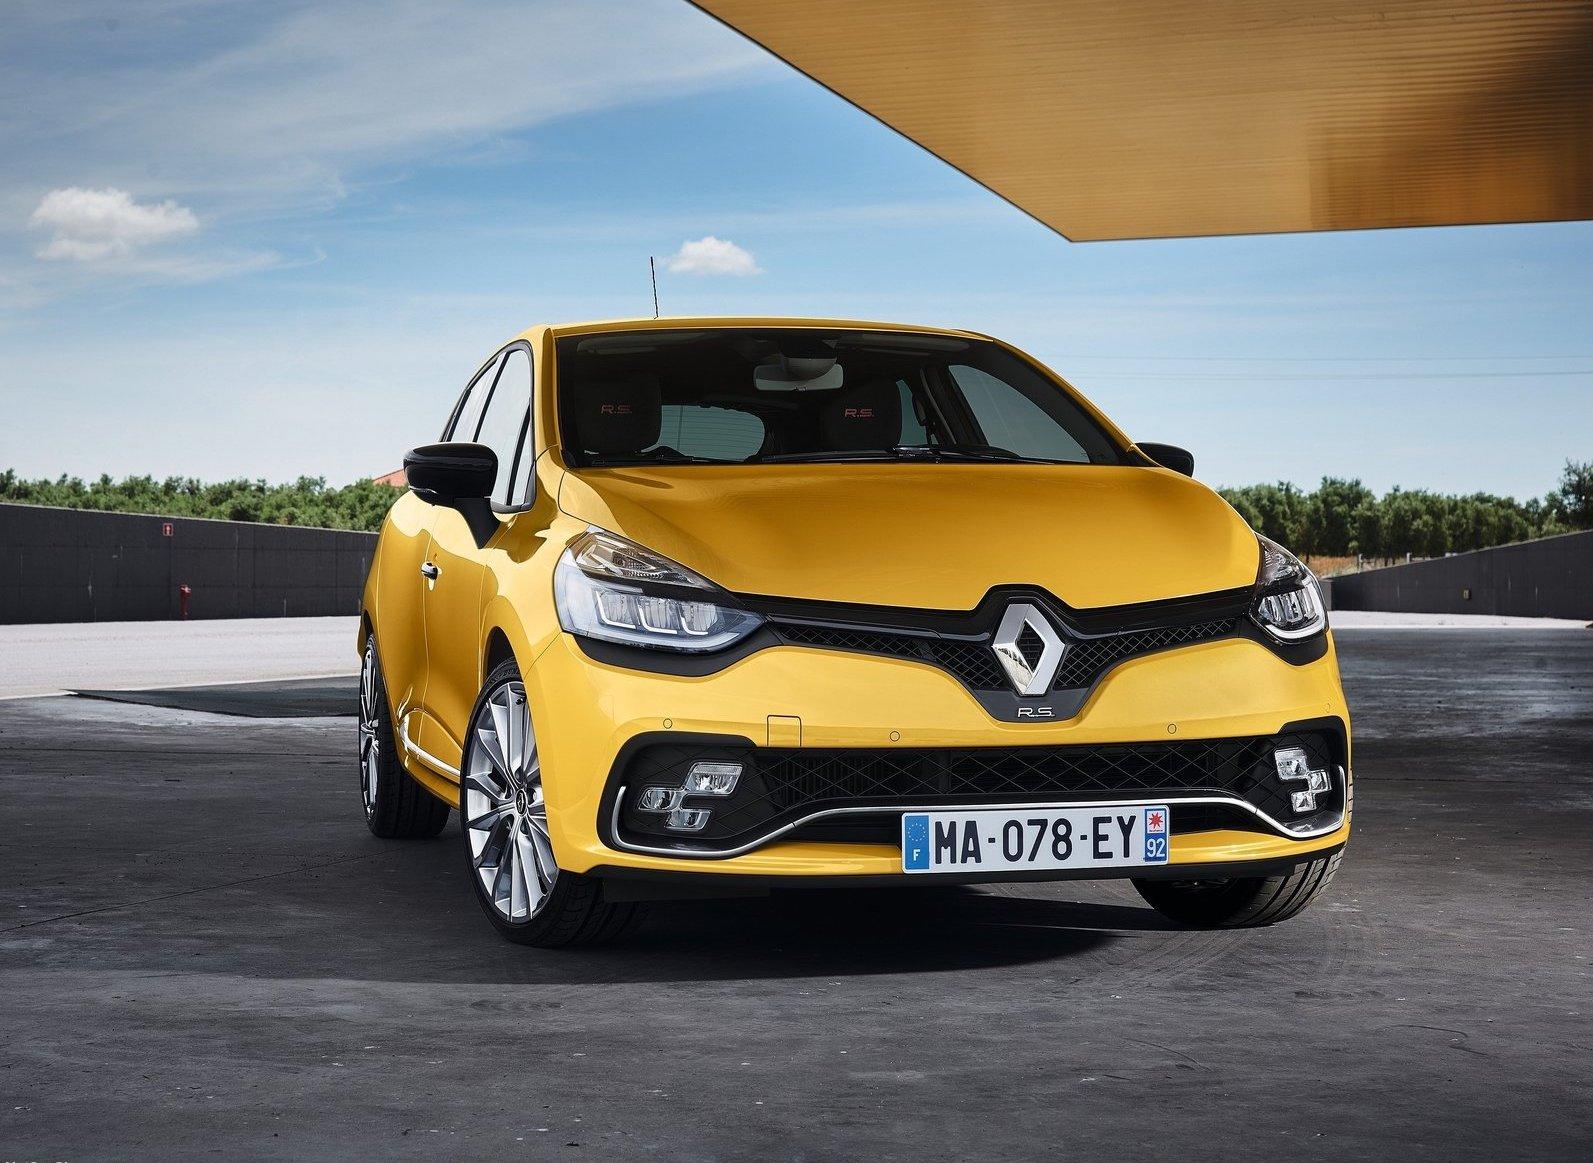 2017 Renault Clio RS